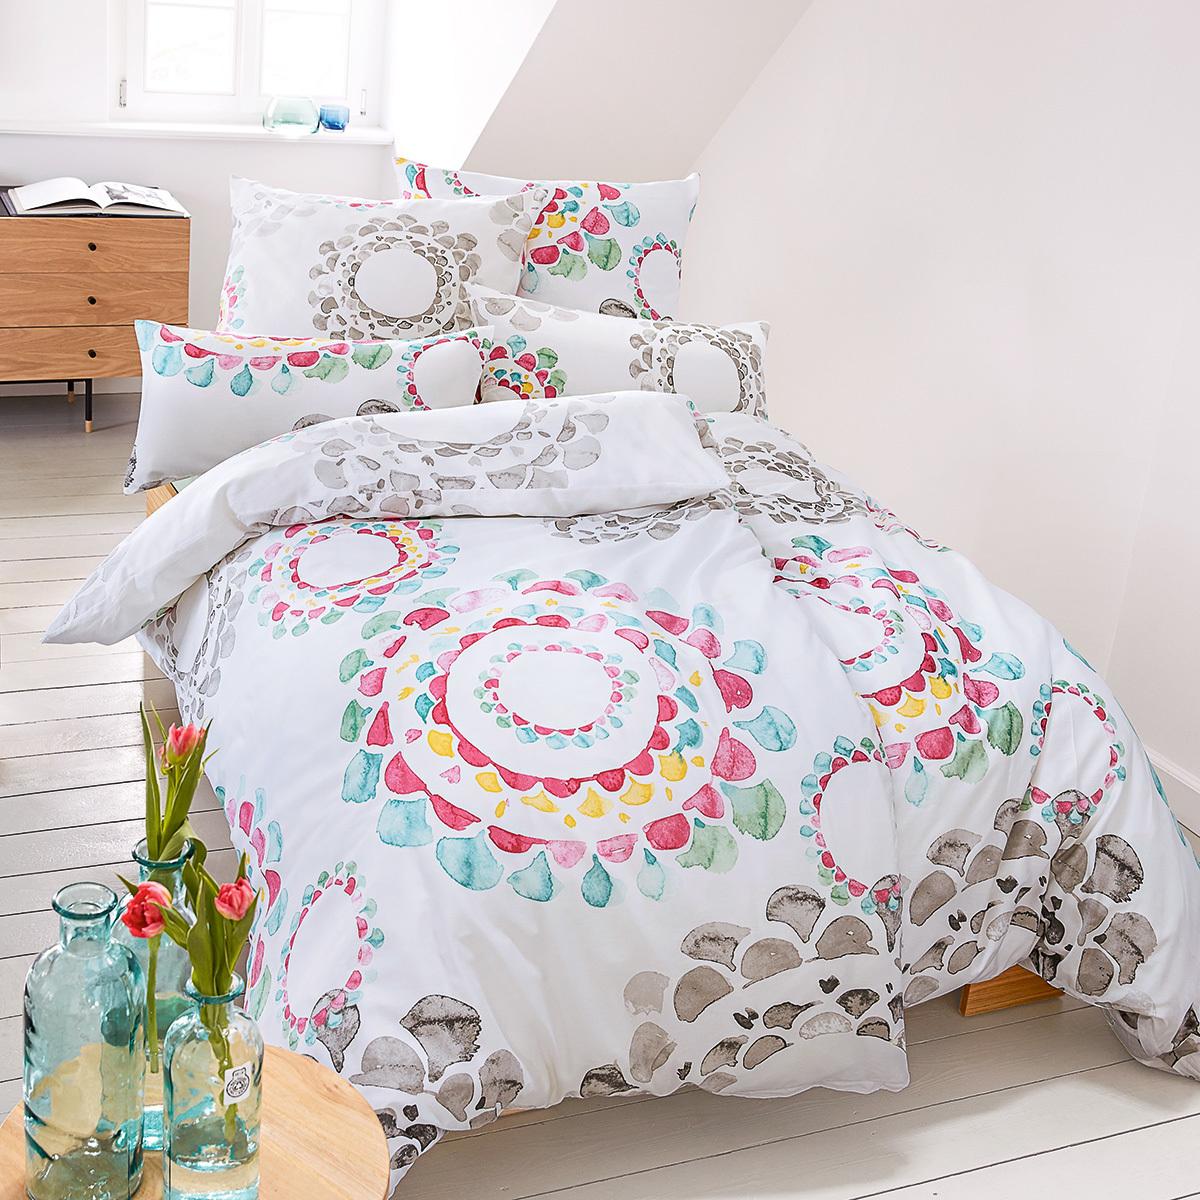 living dreams mako satin bettw sche mandala g nstig online. Black Bedroom Furniture Sets. Home Design Ideas